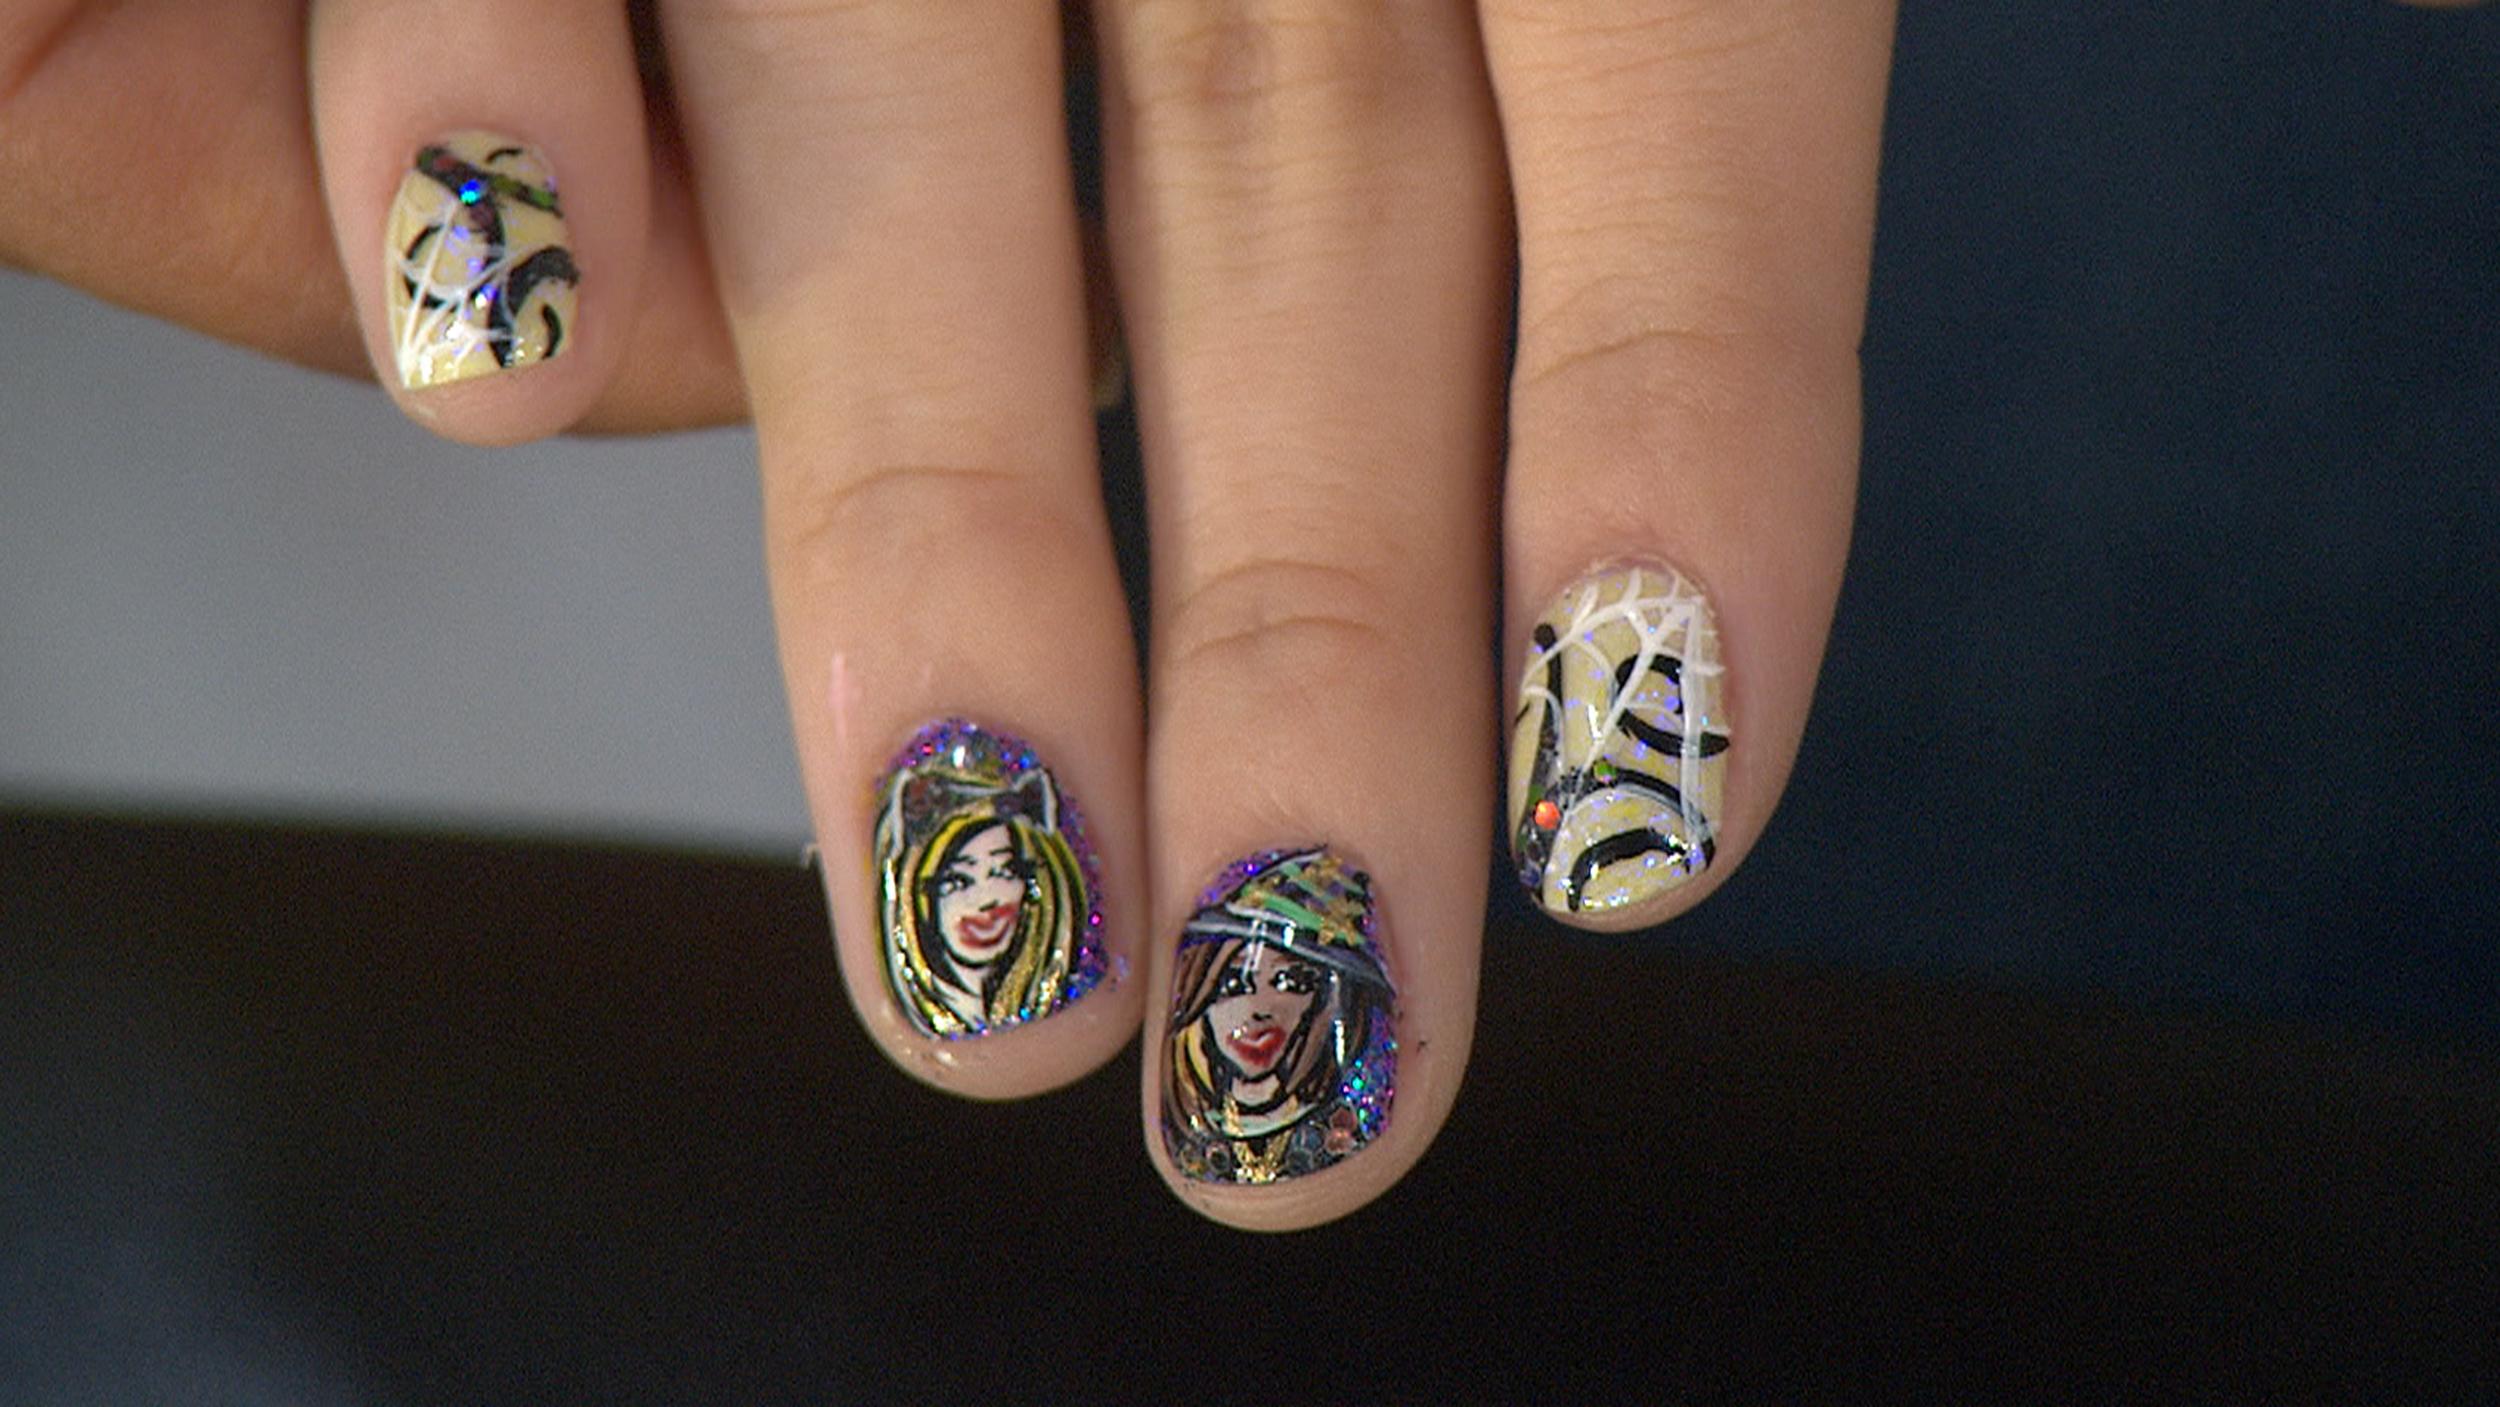 Naild It\' contestants paint fun, fall-themed Halloween nail art